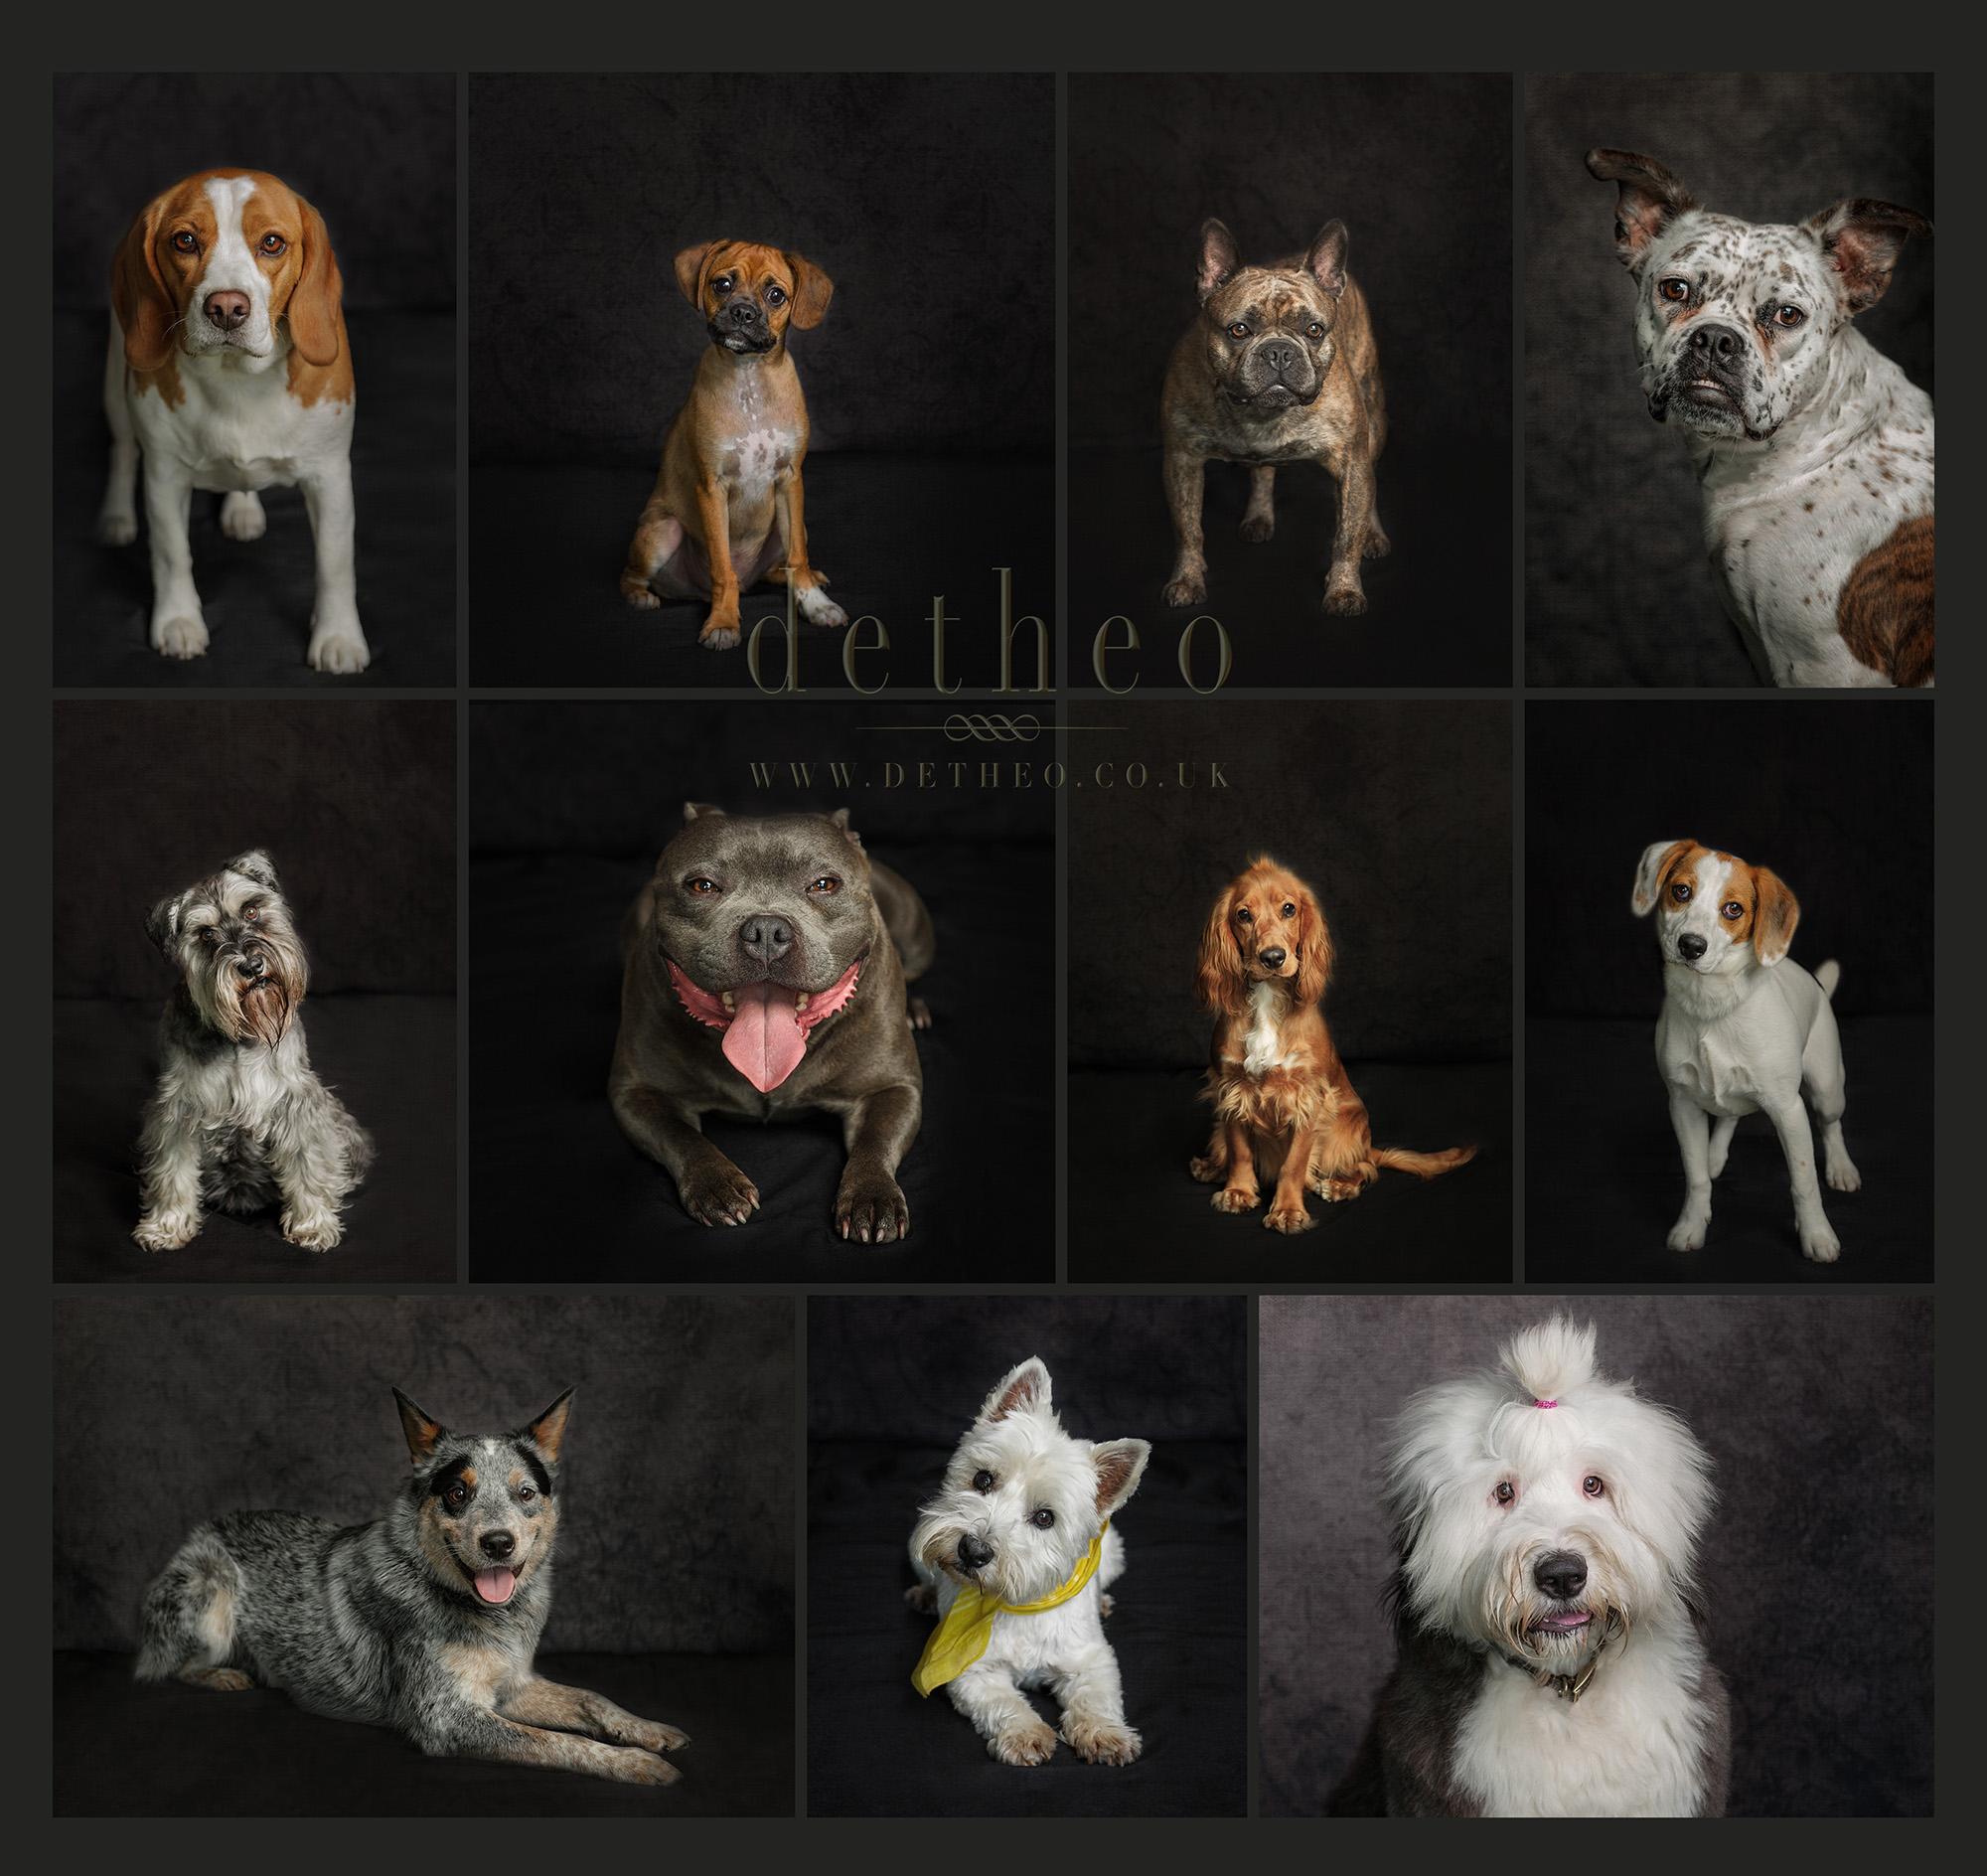 Sawbridgeworth Dog Show collage